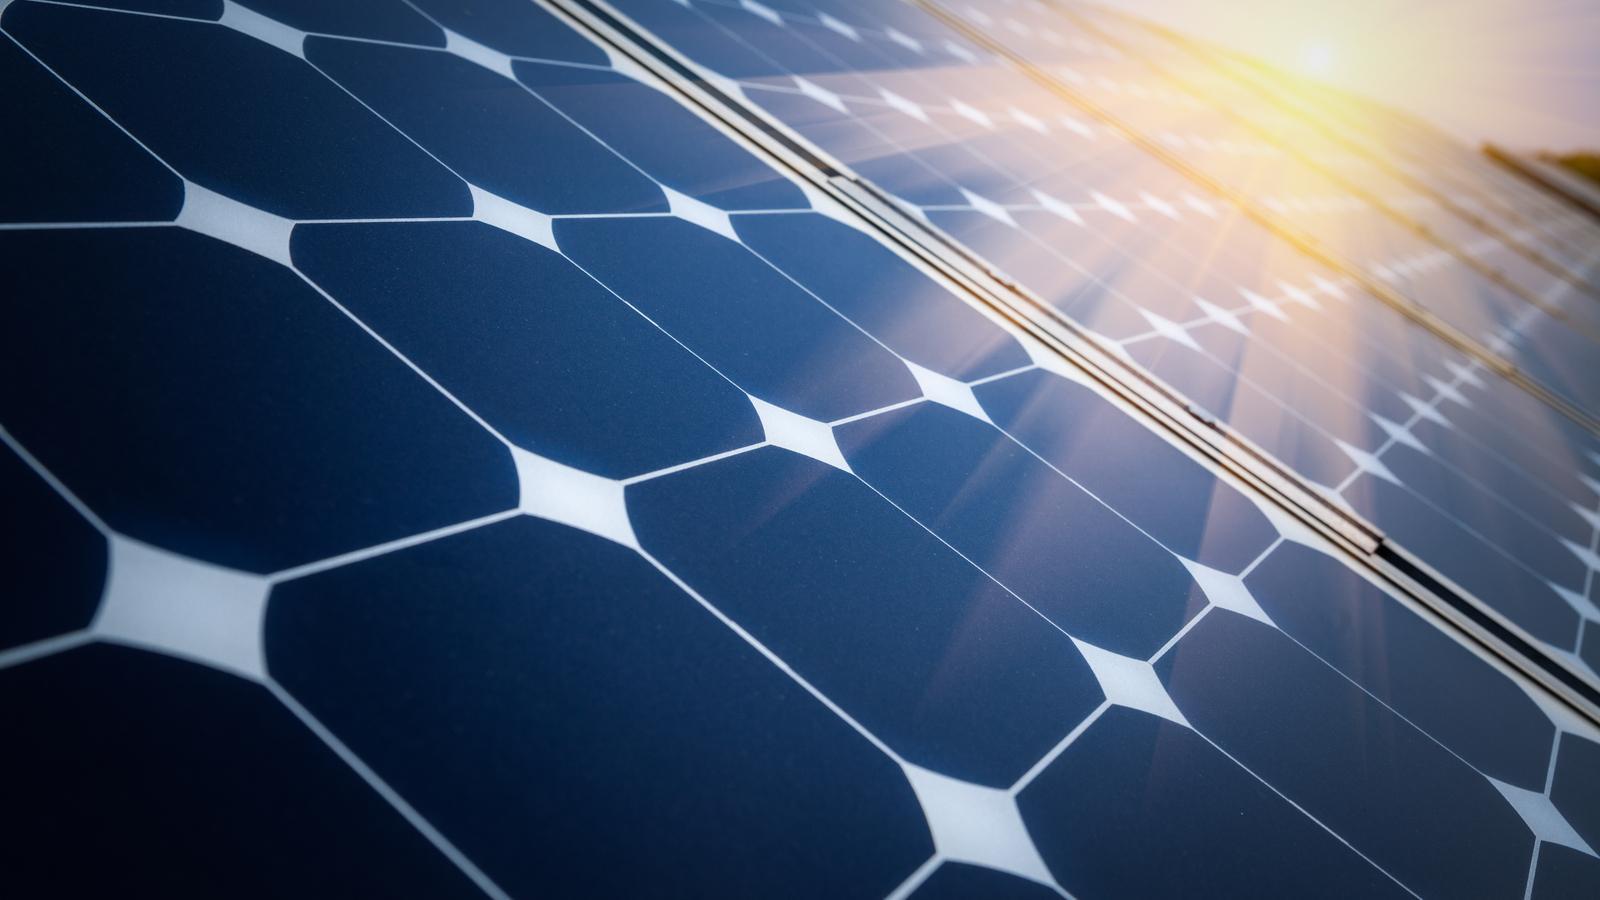 Solar Panel with Sun Shining